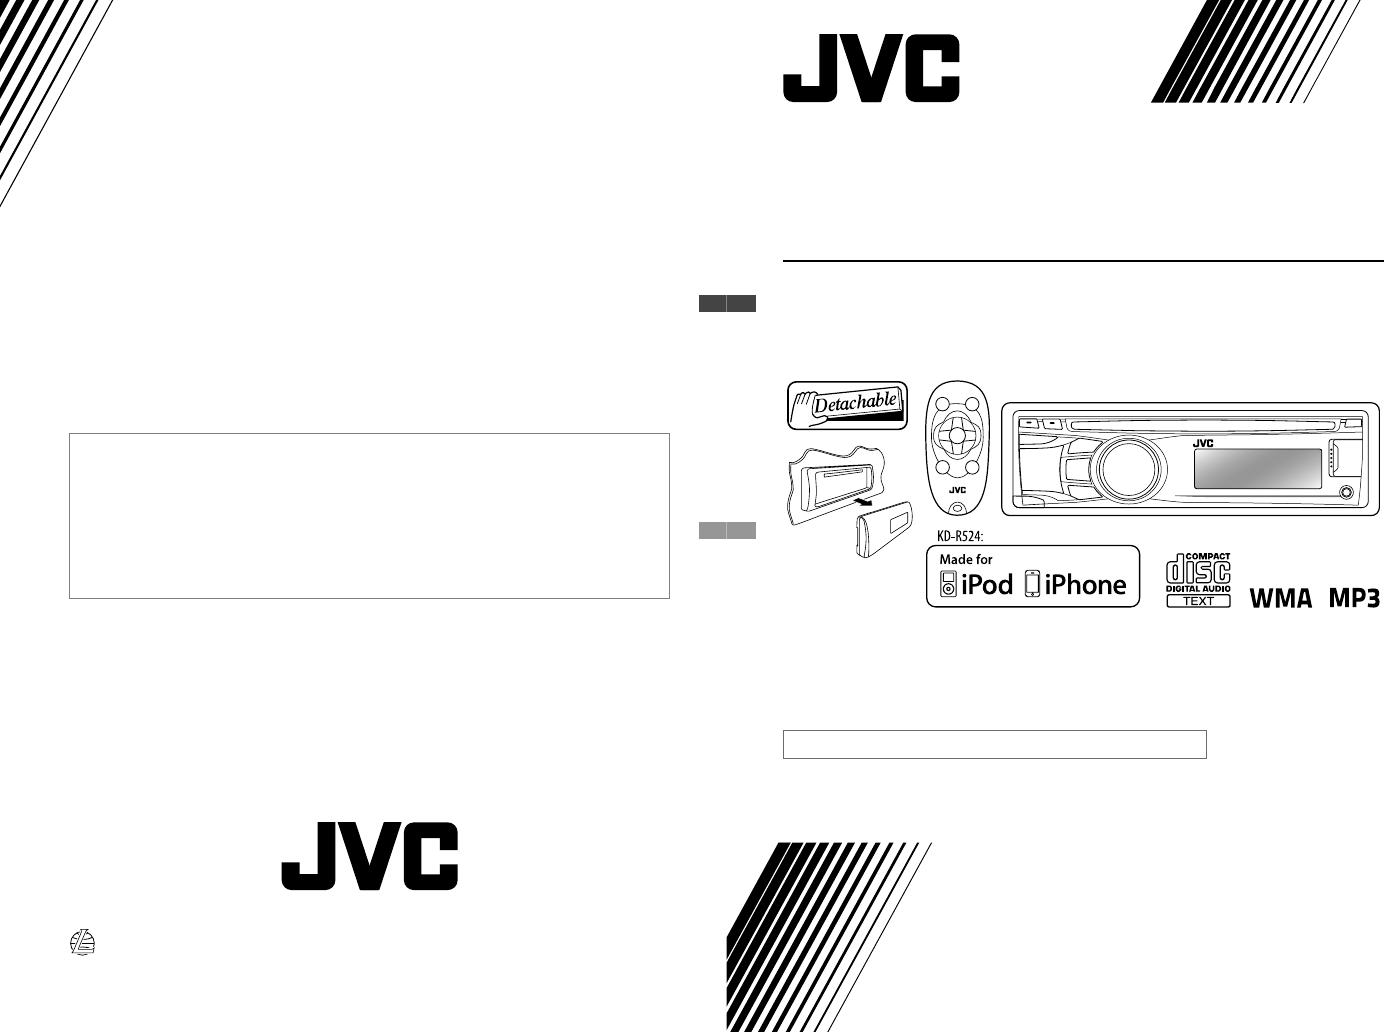 JVC KD R424UI CoverRear_KD R524[UI]f User Manual GET0703 001AUserManual.wiki